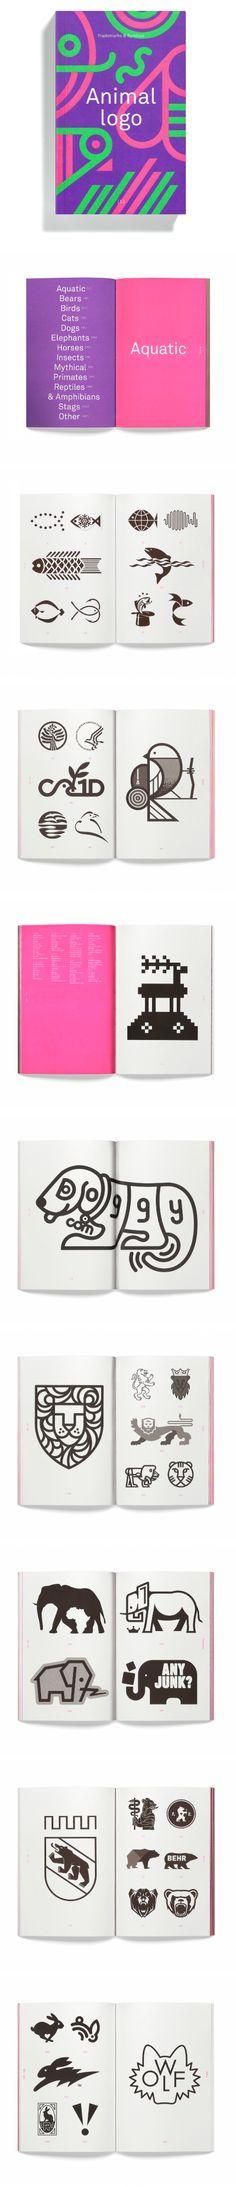 Animal Logo: Trademarks and Symbols - Counter Print